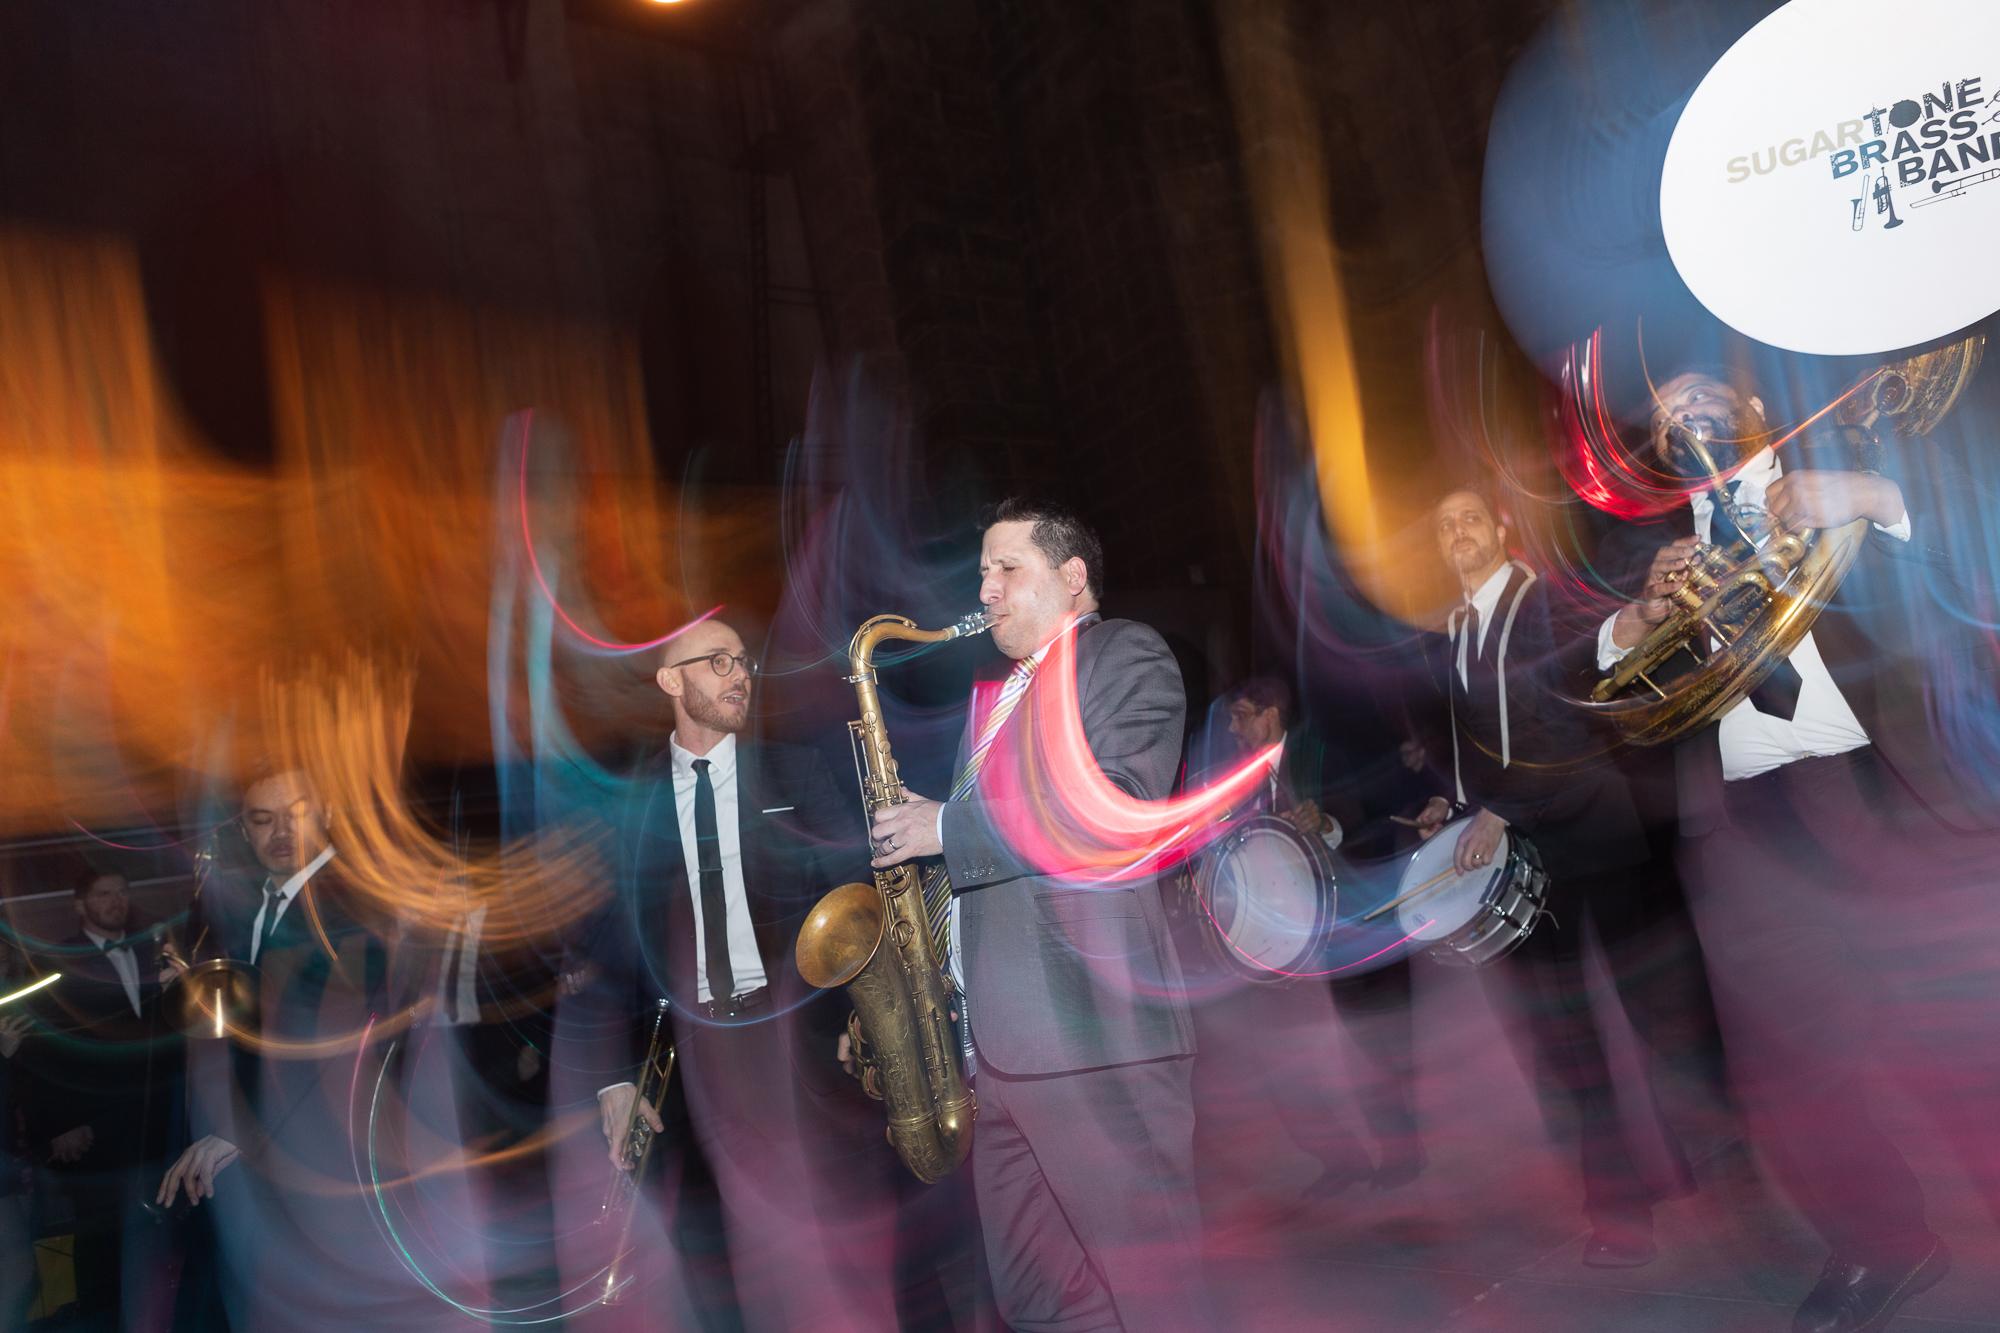 Sugartone  Brass Band_photo credit Ethan Covey.jpg